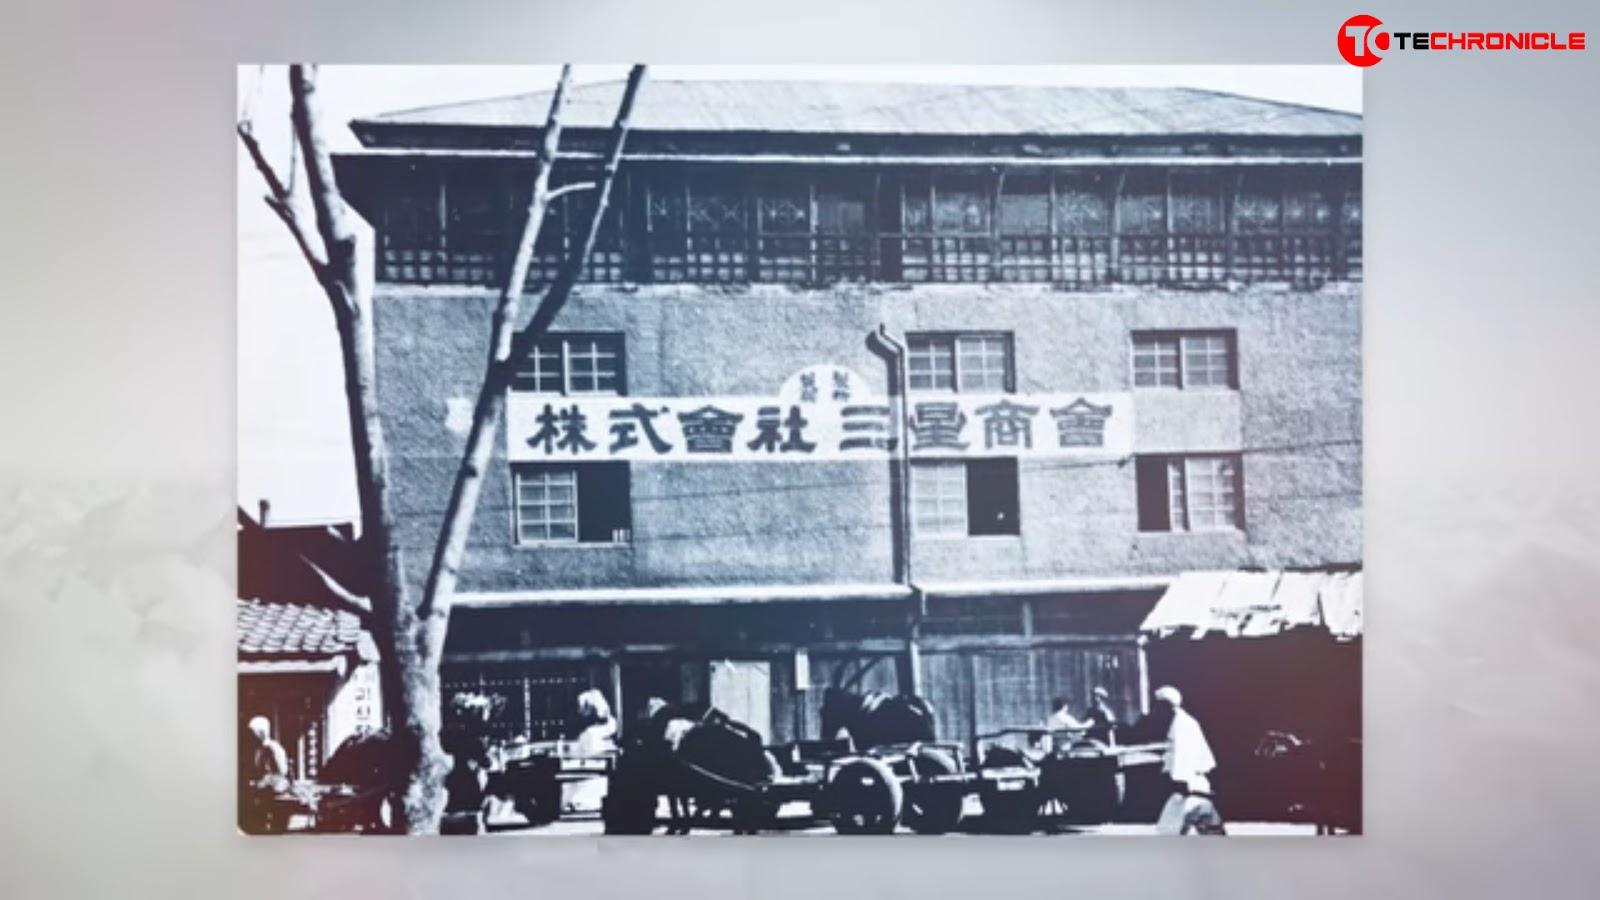 Samsung Old Photo Techronicle